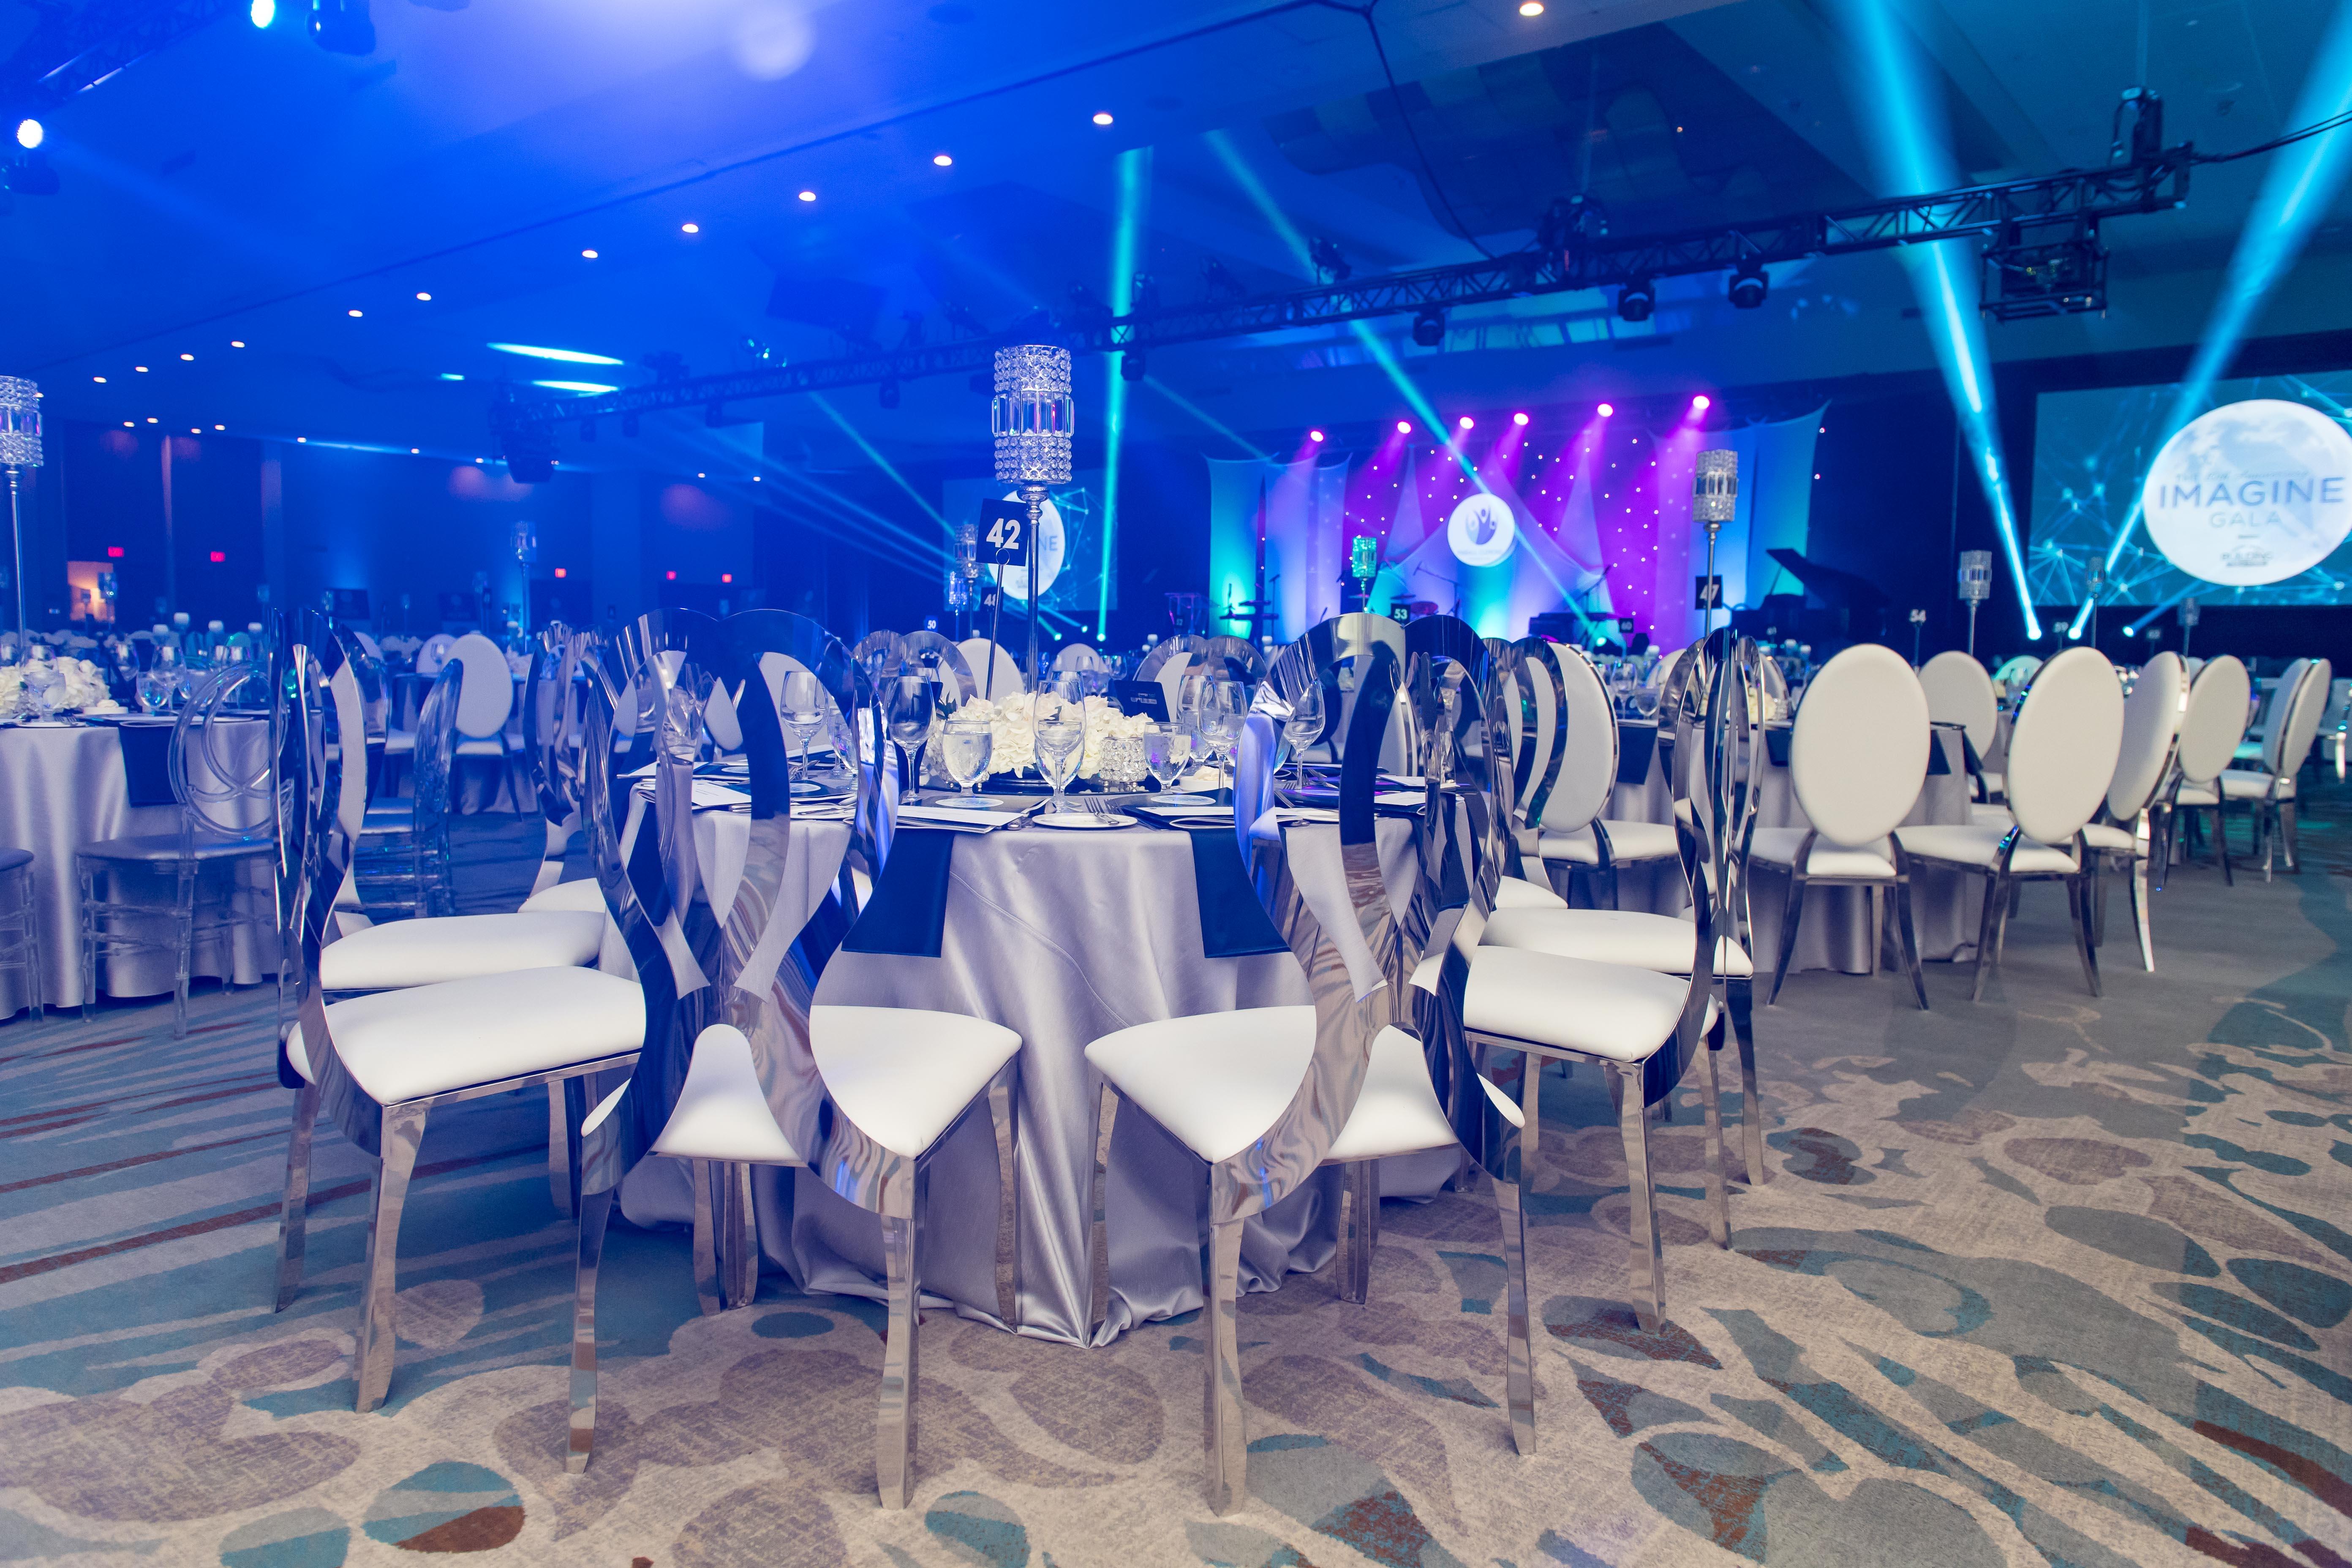 Imagine Gala Final-21.jpg